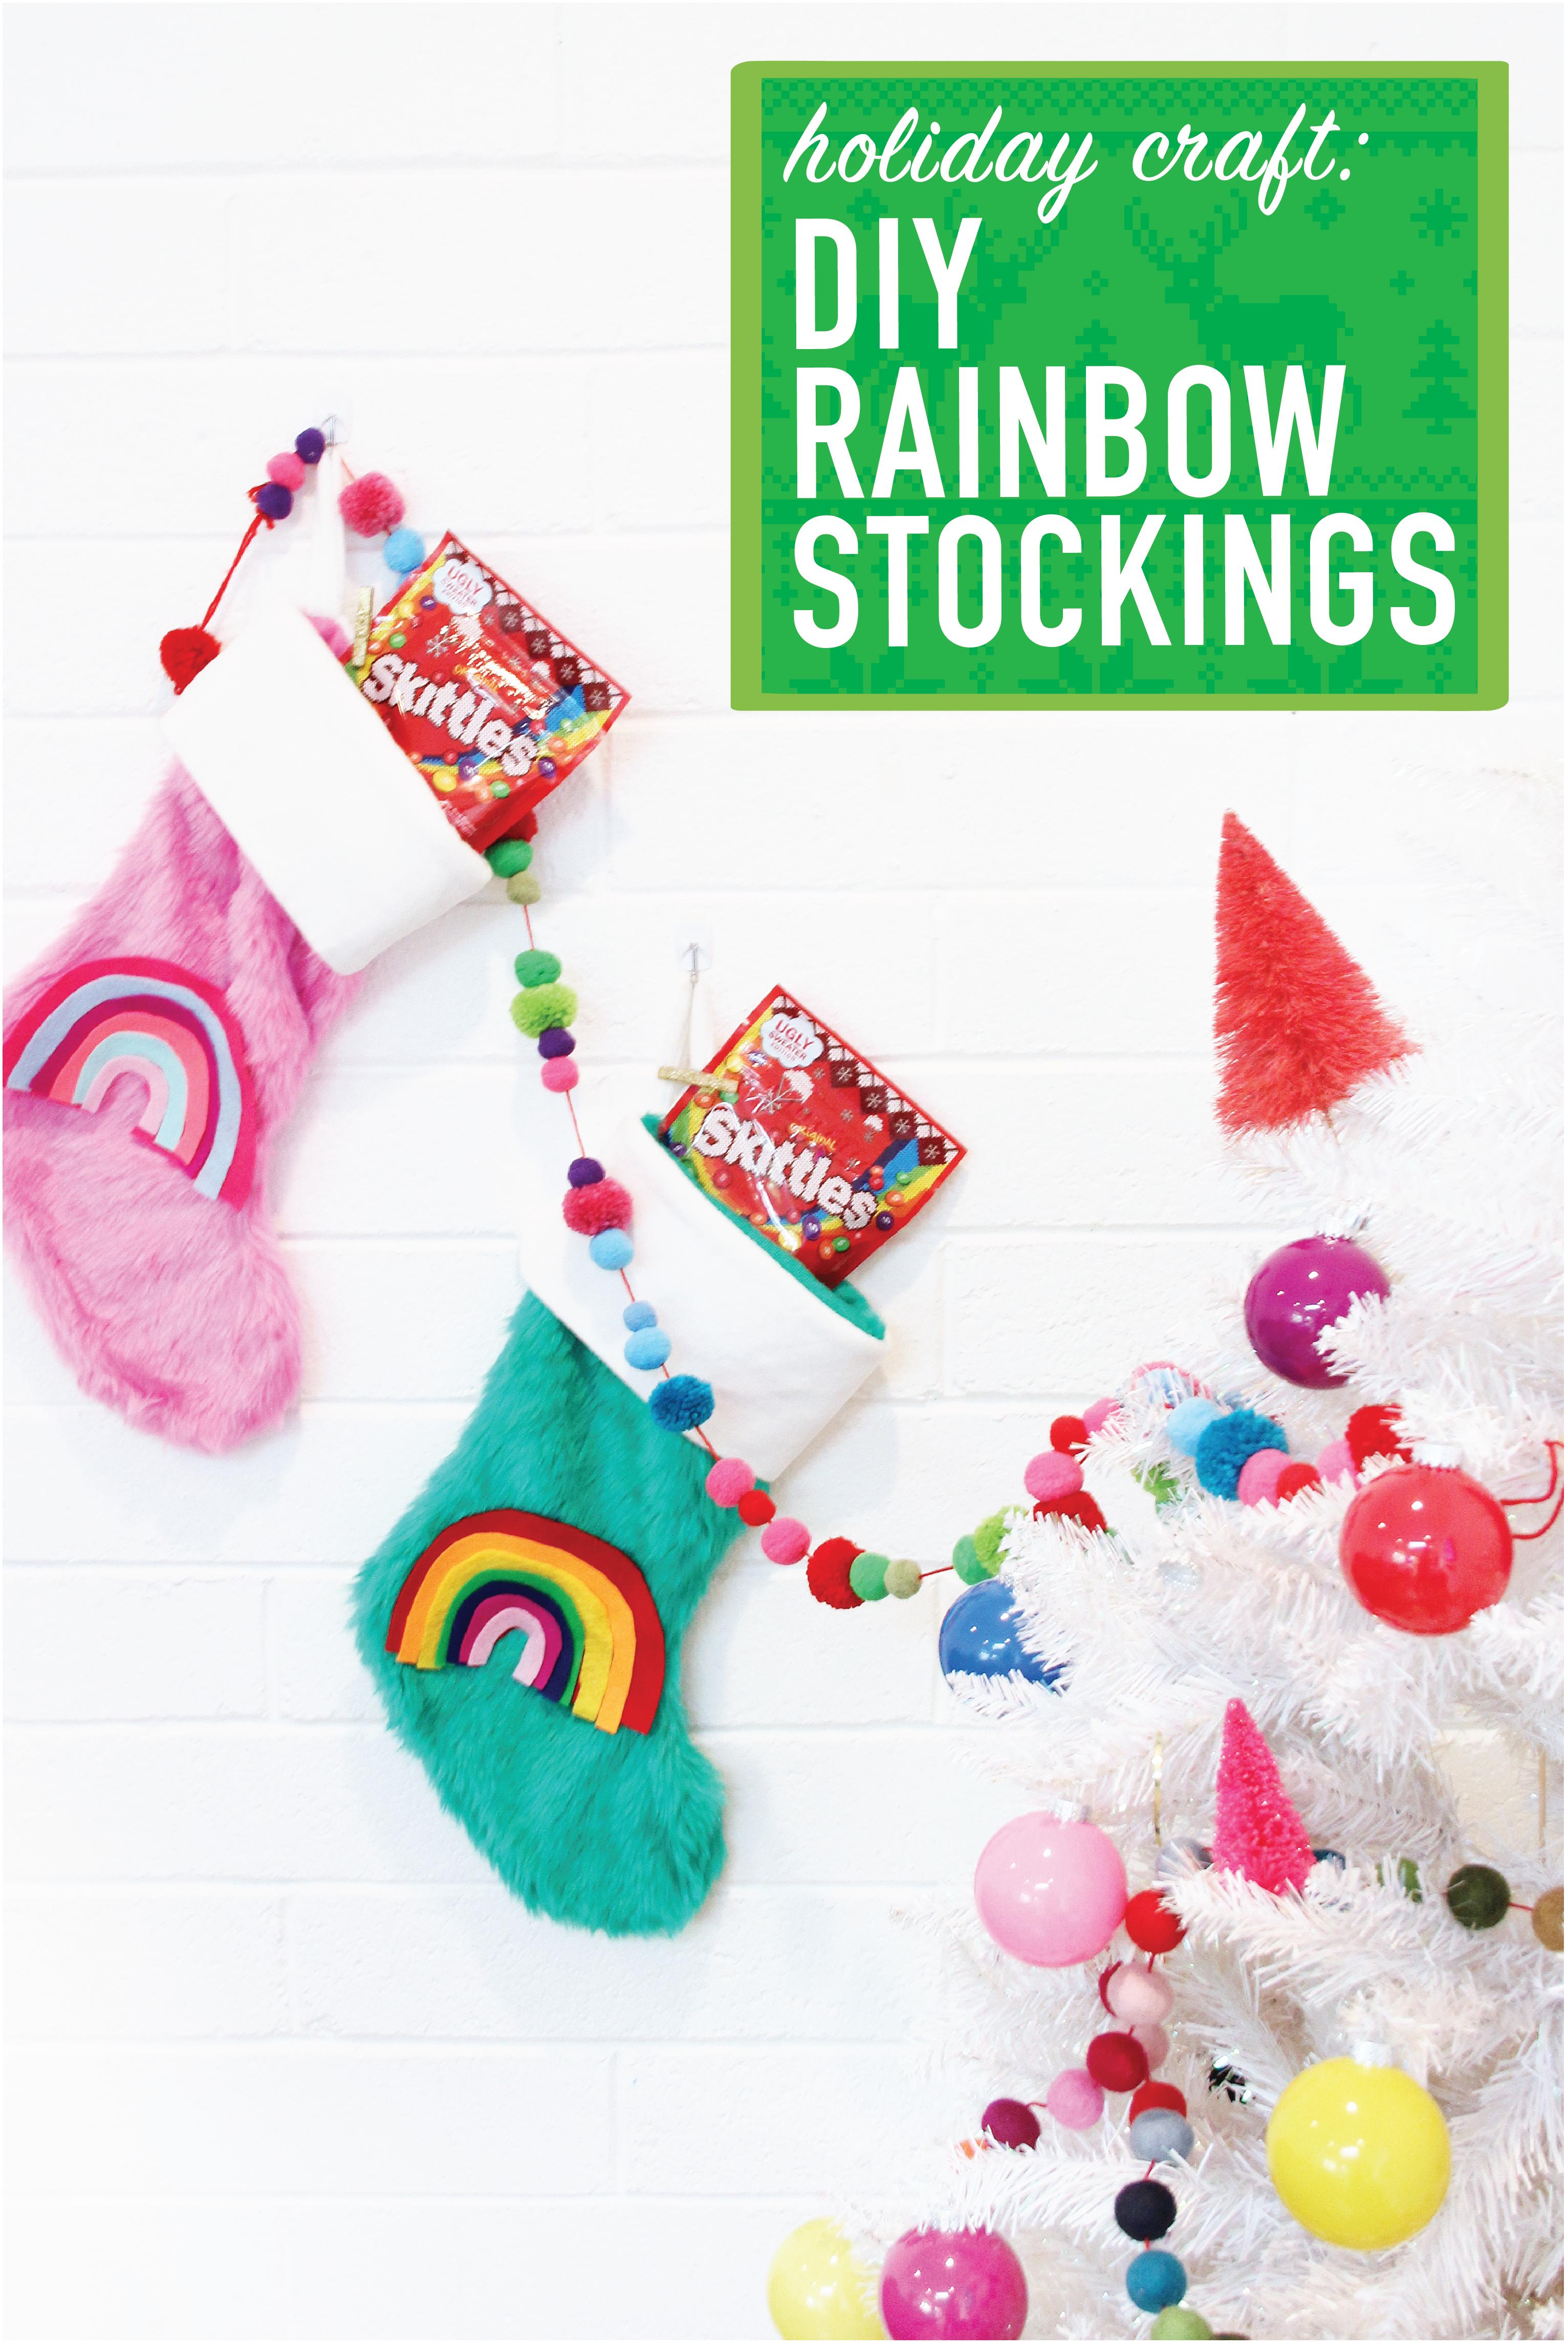 DIY Rainbow Christmas Stockings | Pinterest | King soopers, Fred ...